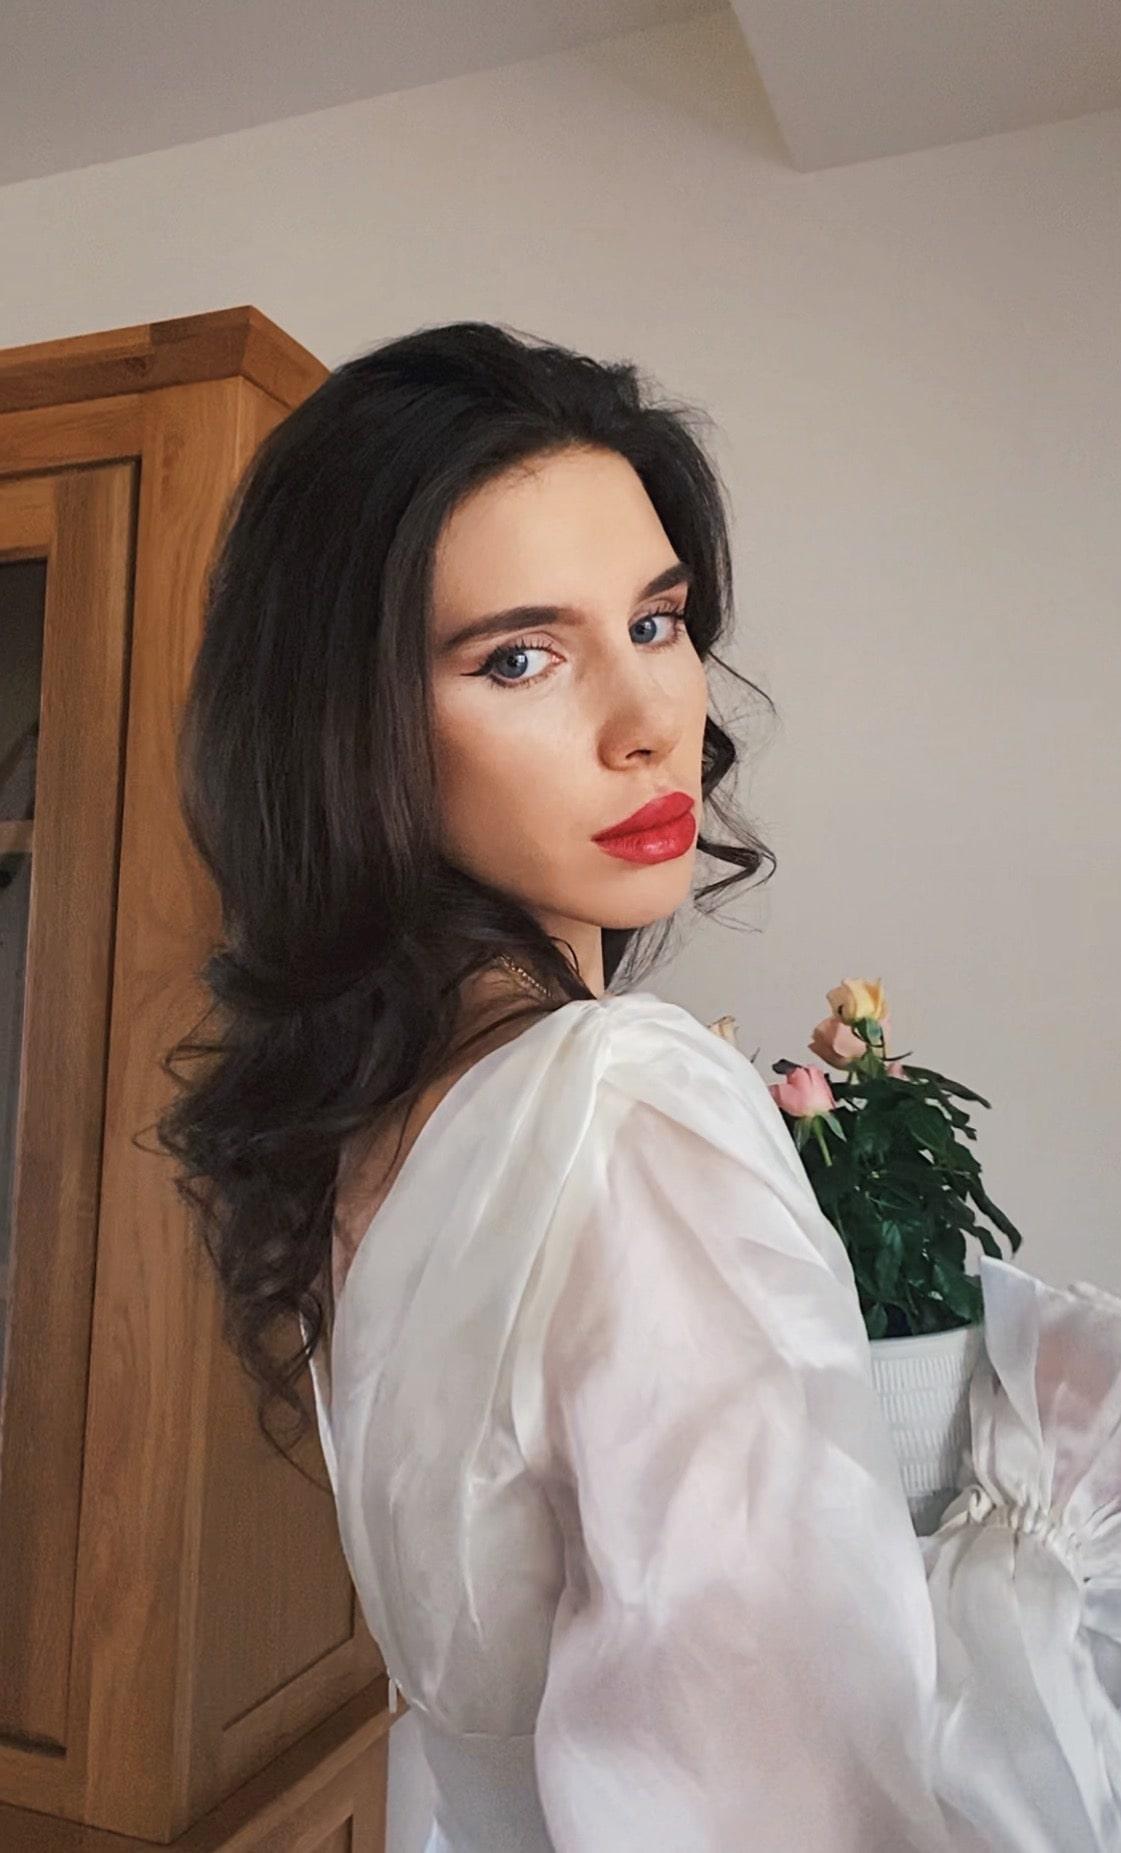 Maria Gureeva